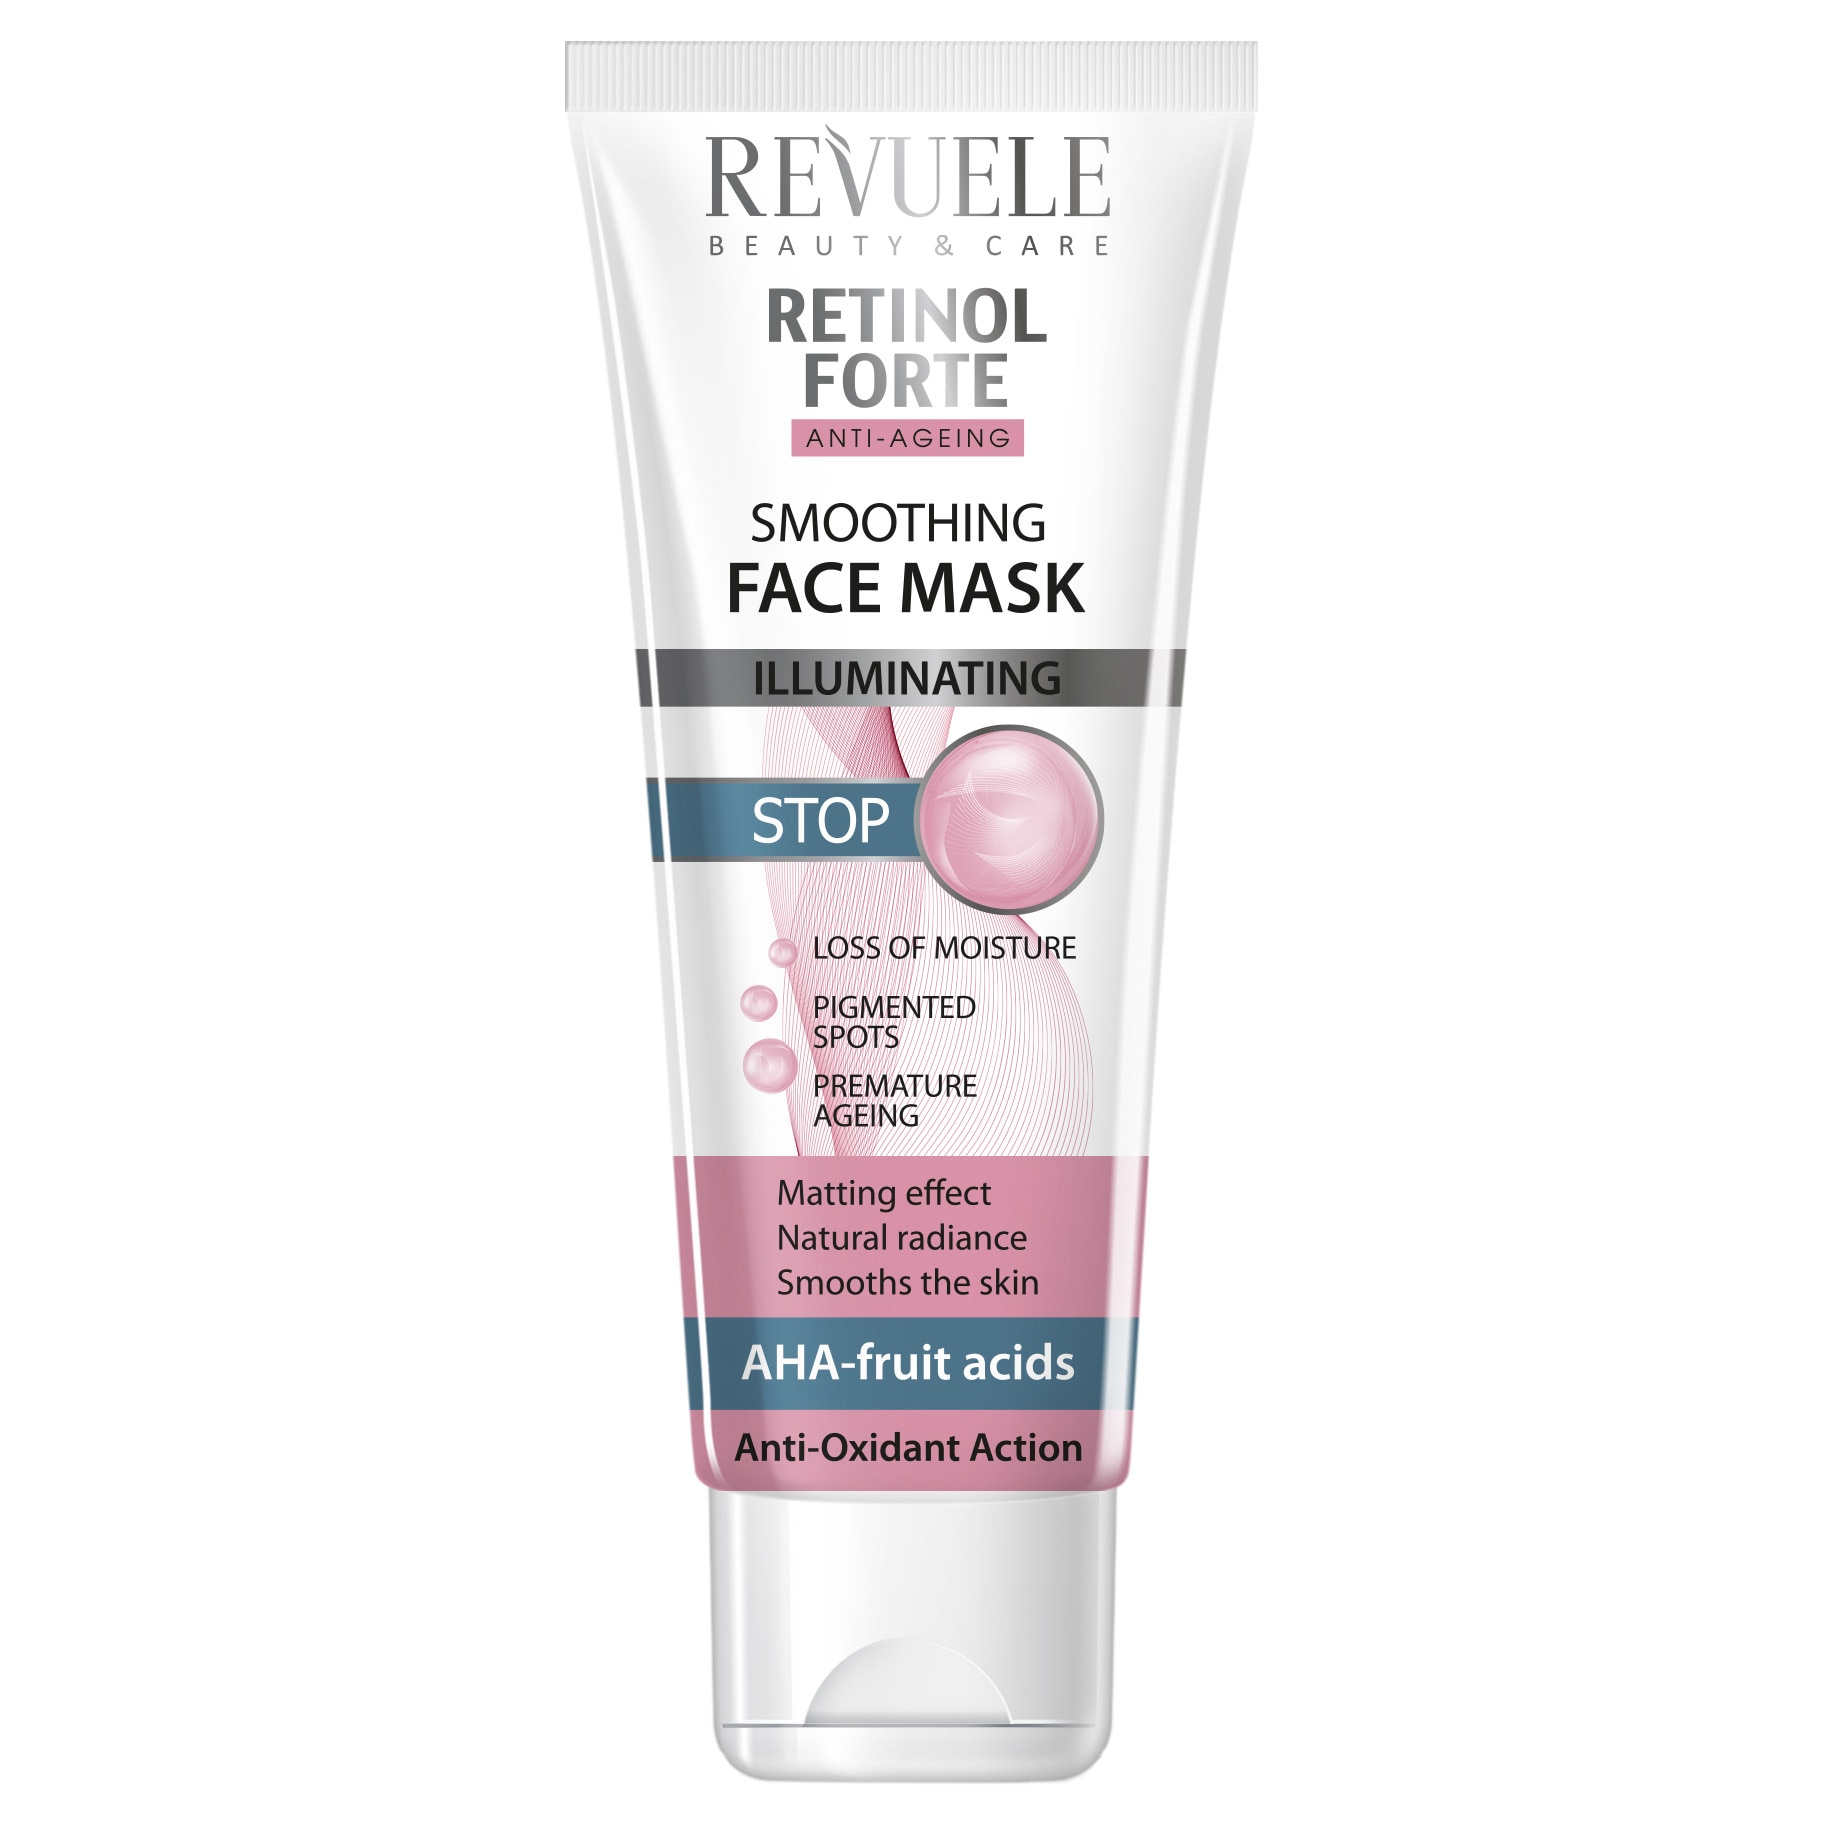 Revuele retinol forte smoothing face mask 80ml